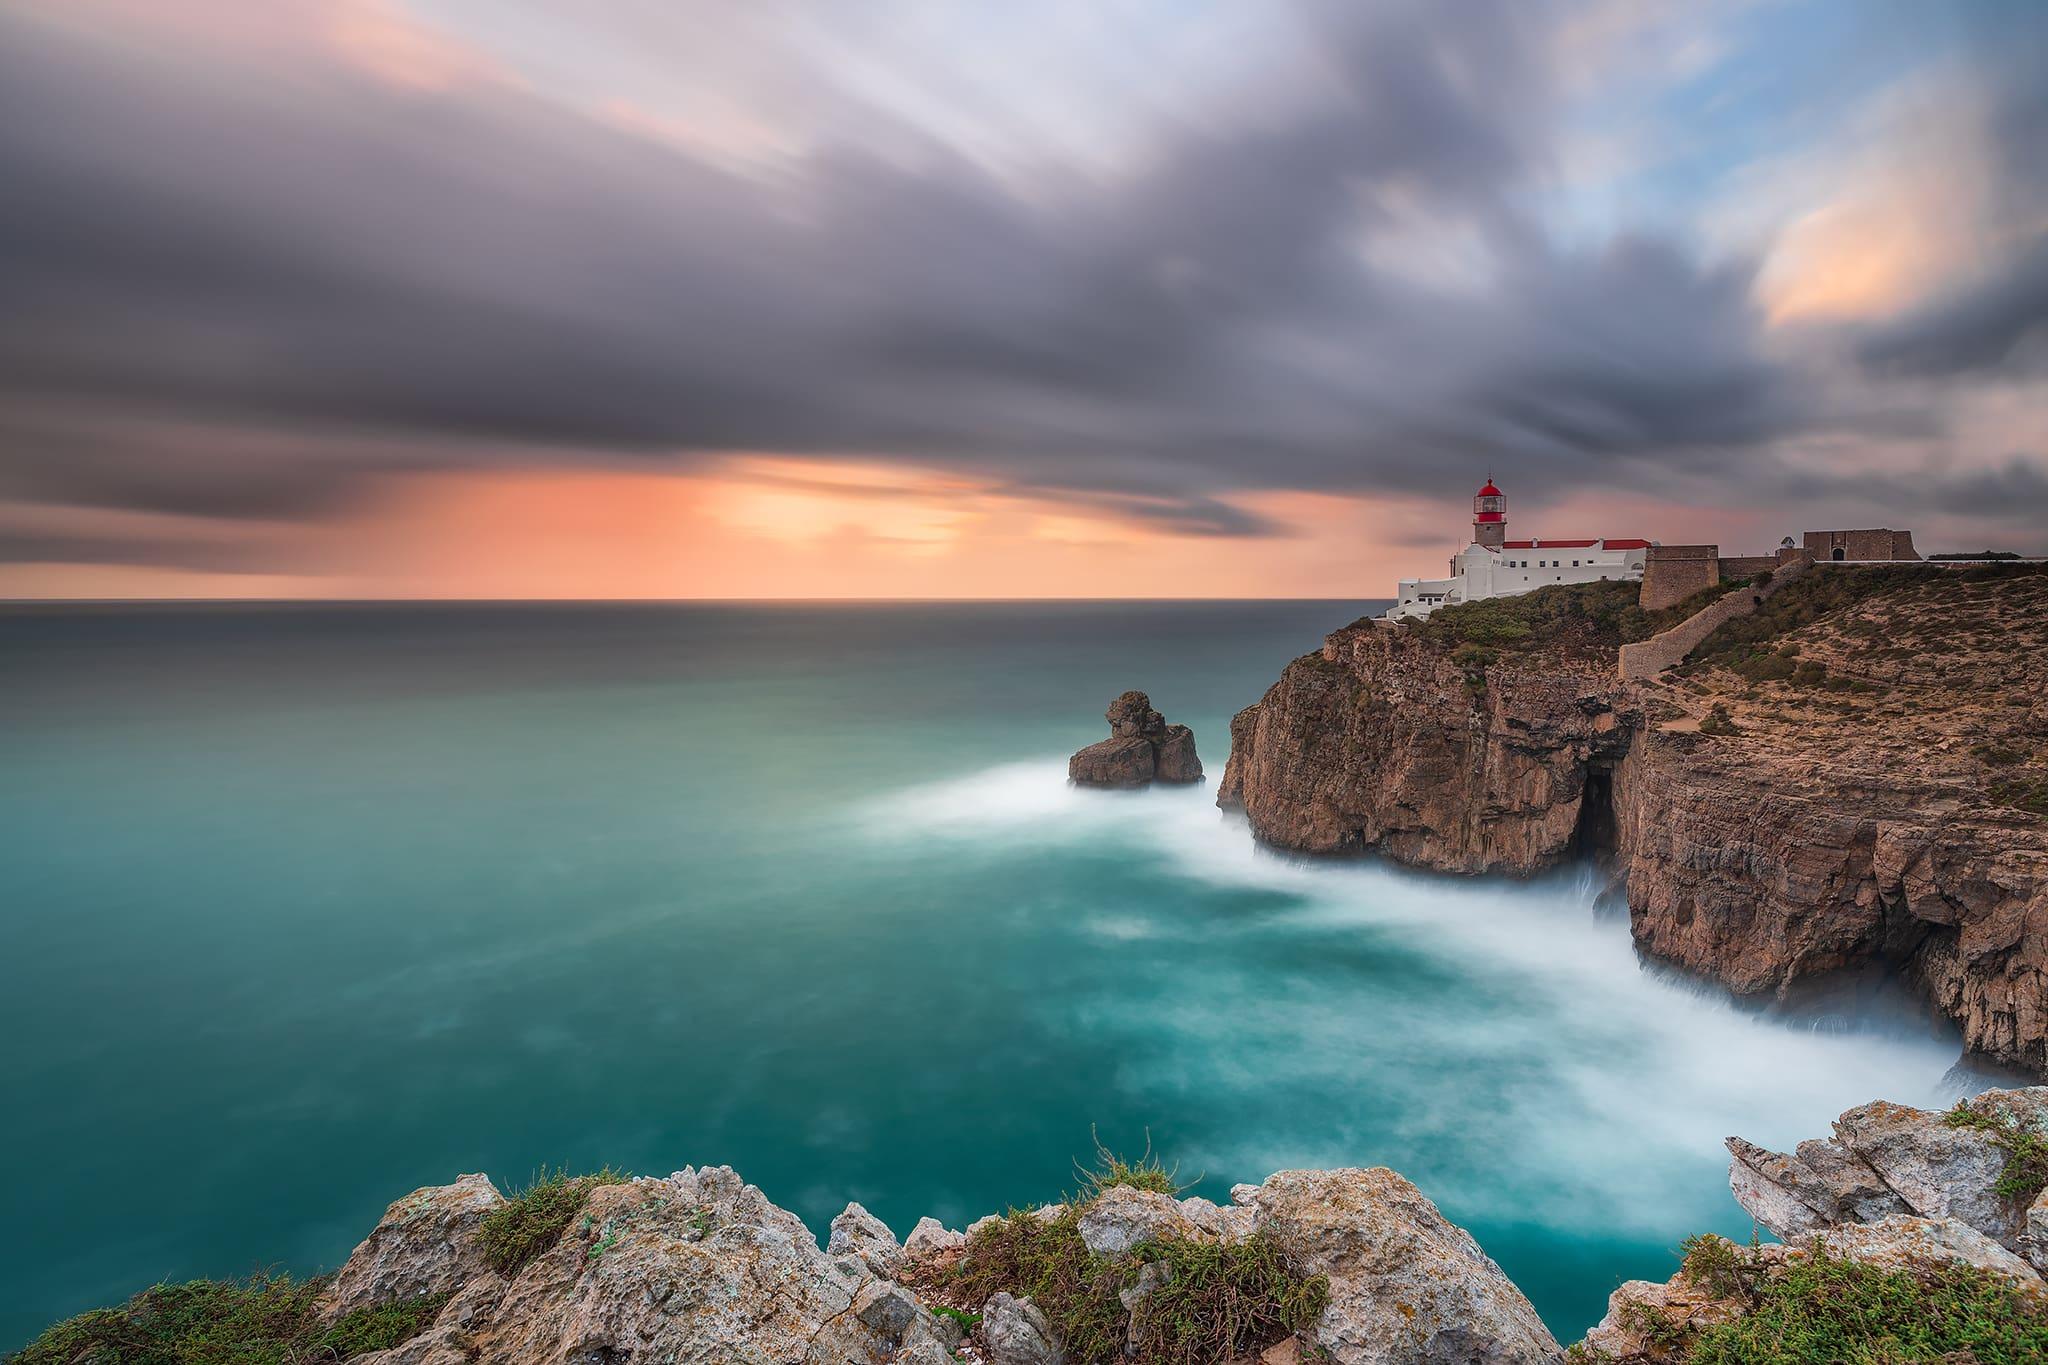 Francesco Gola Seascape Long Exposure Photography Landscape Portugal Europe Algarve Cabo Vicente Lighthouse